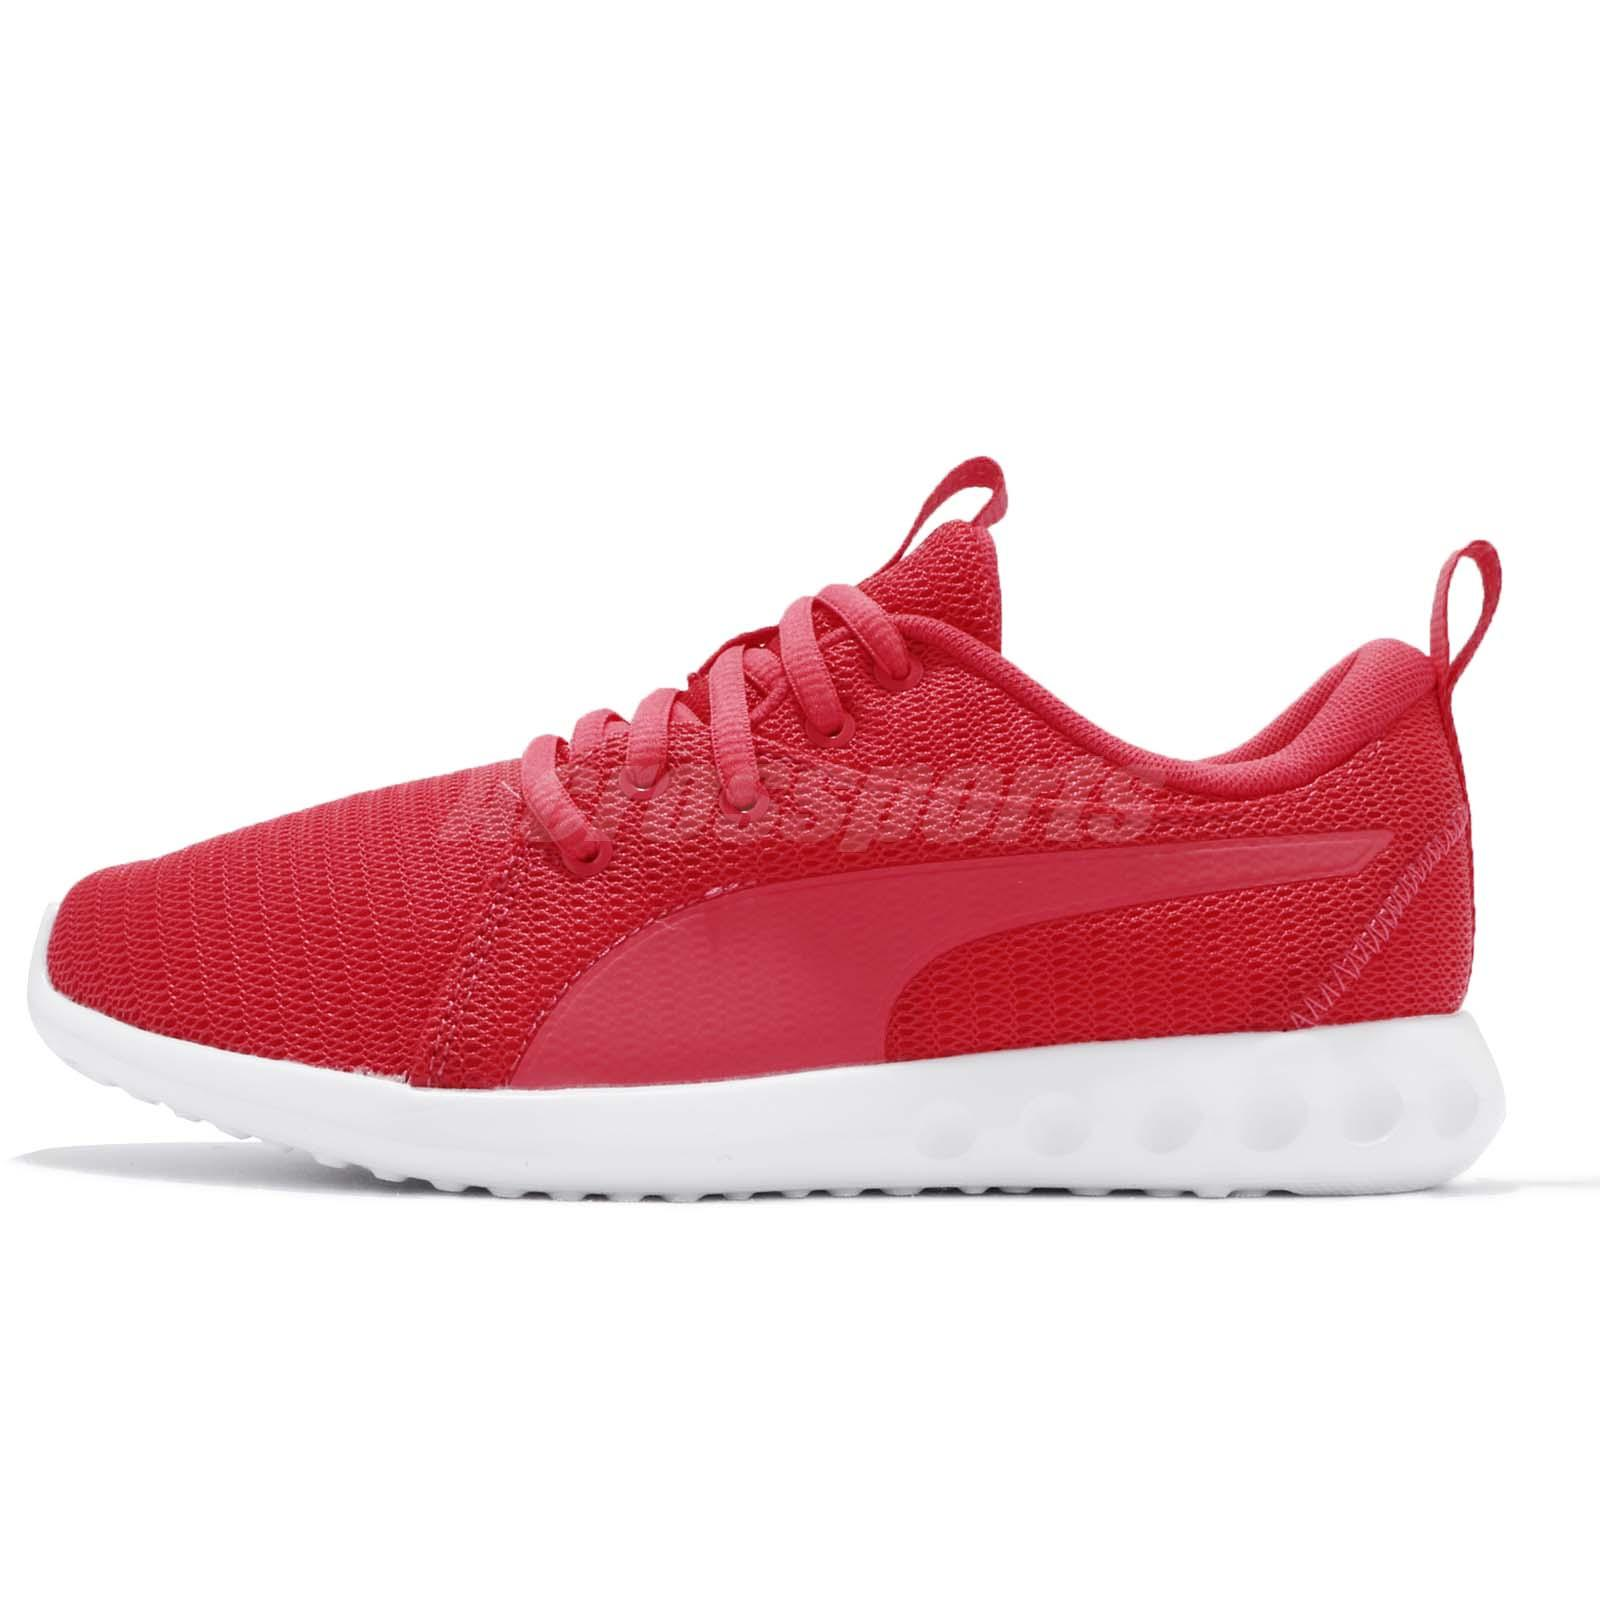 90aee447e16 Puma Carson 2 Wns II Paradise Pink Peach Women Running Shoes Sneakers  190038-05